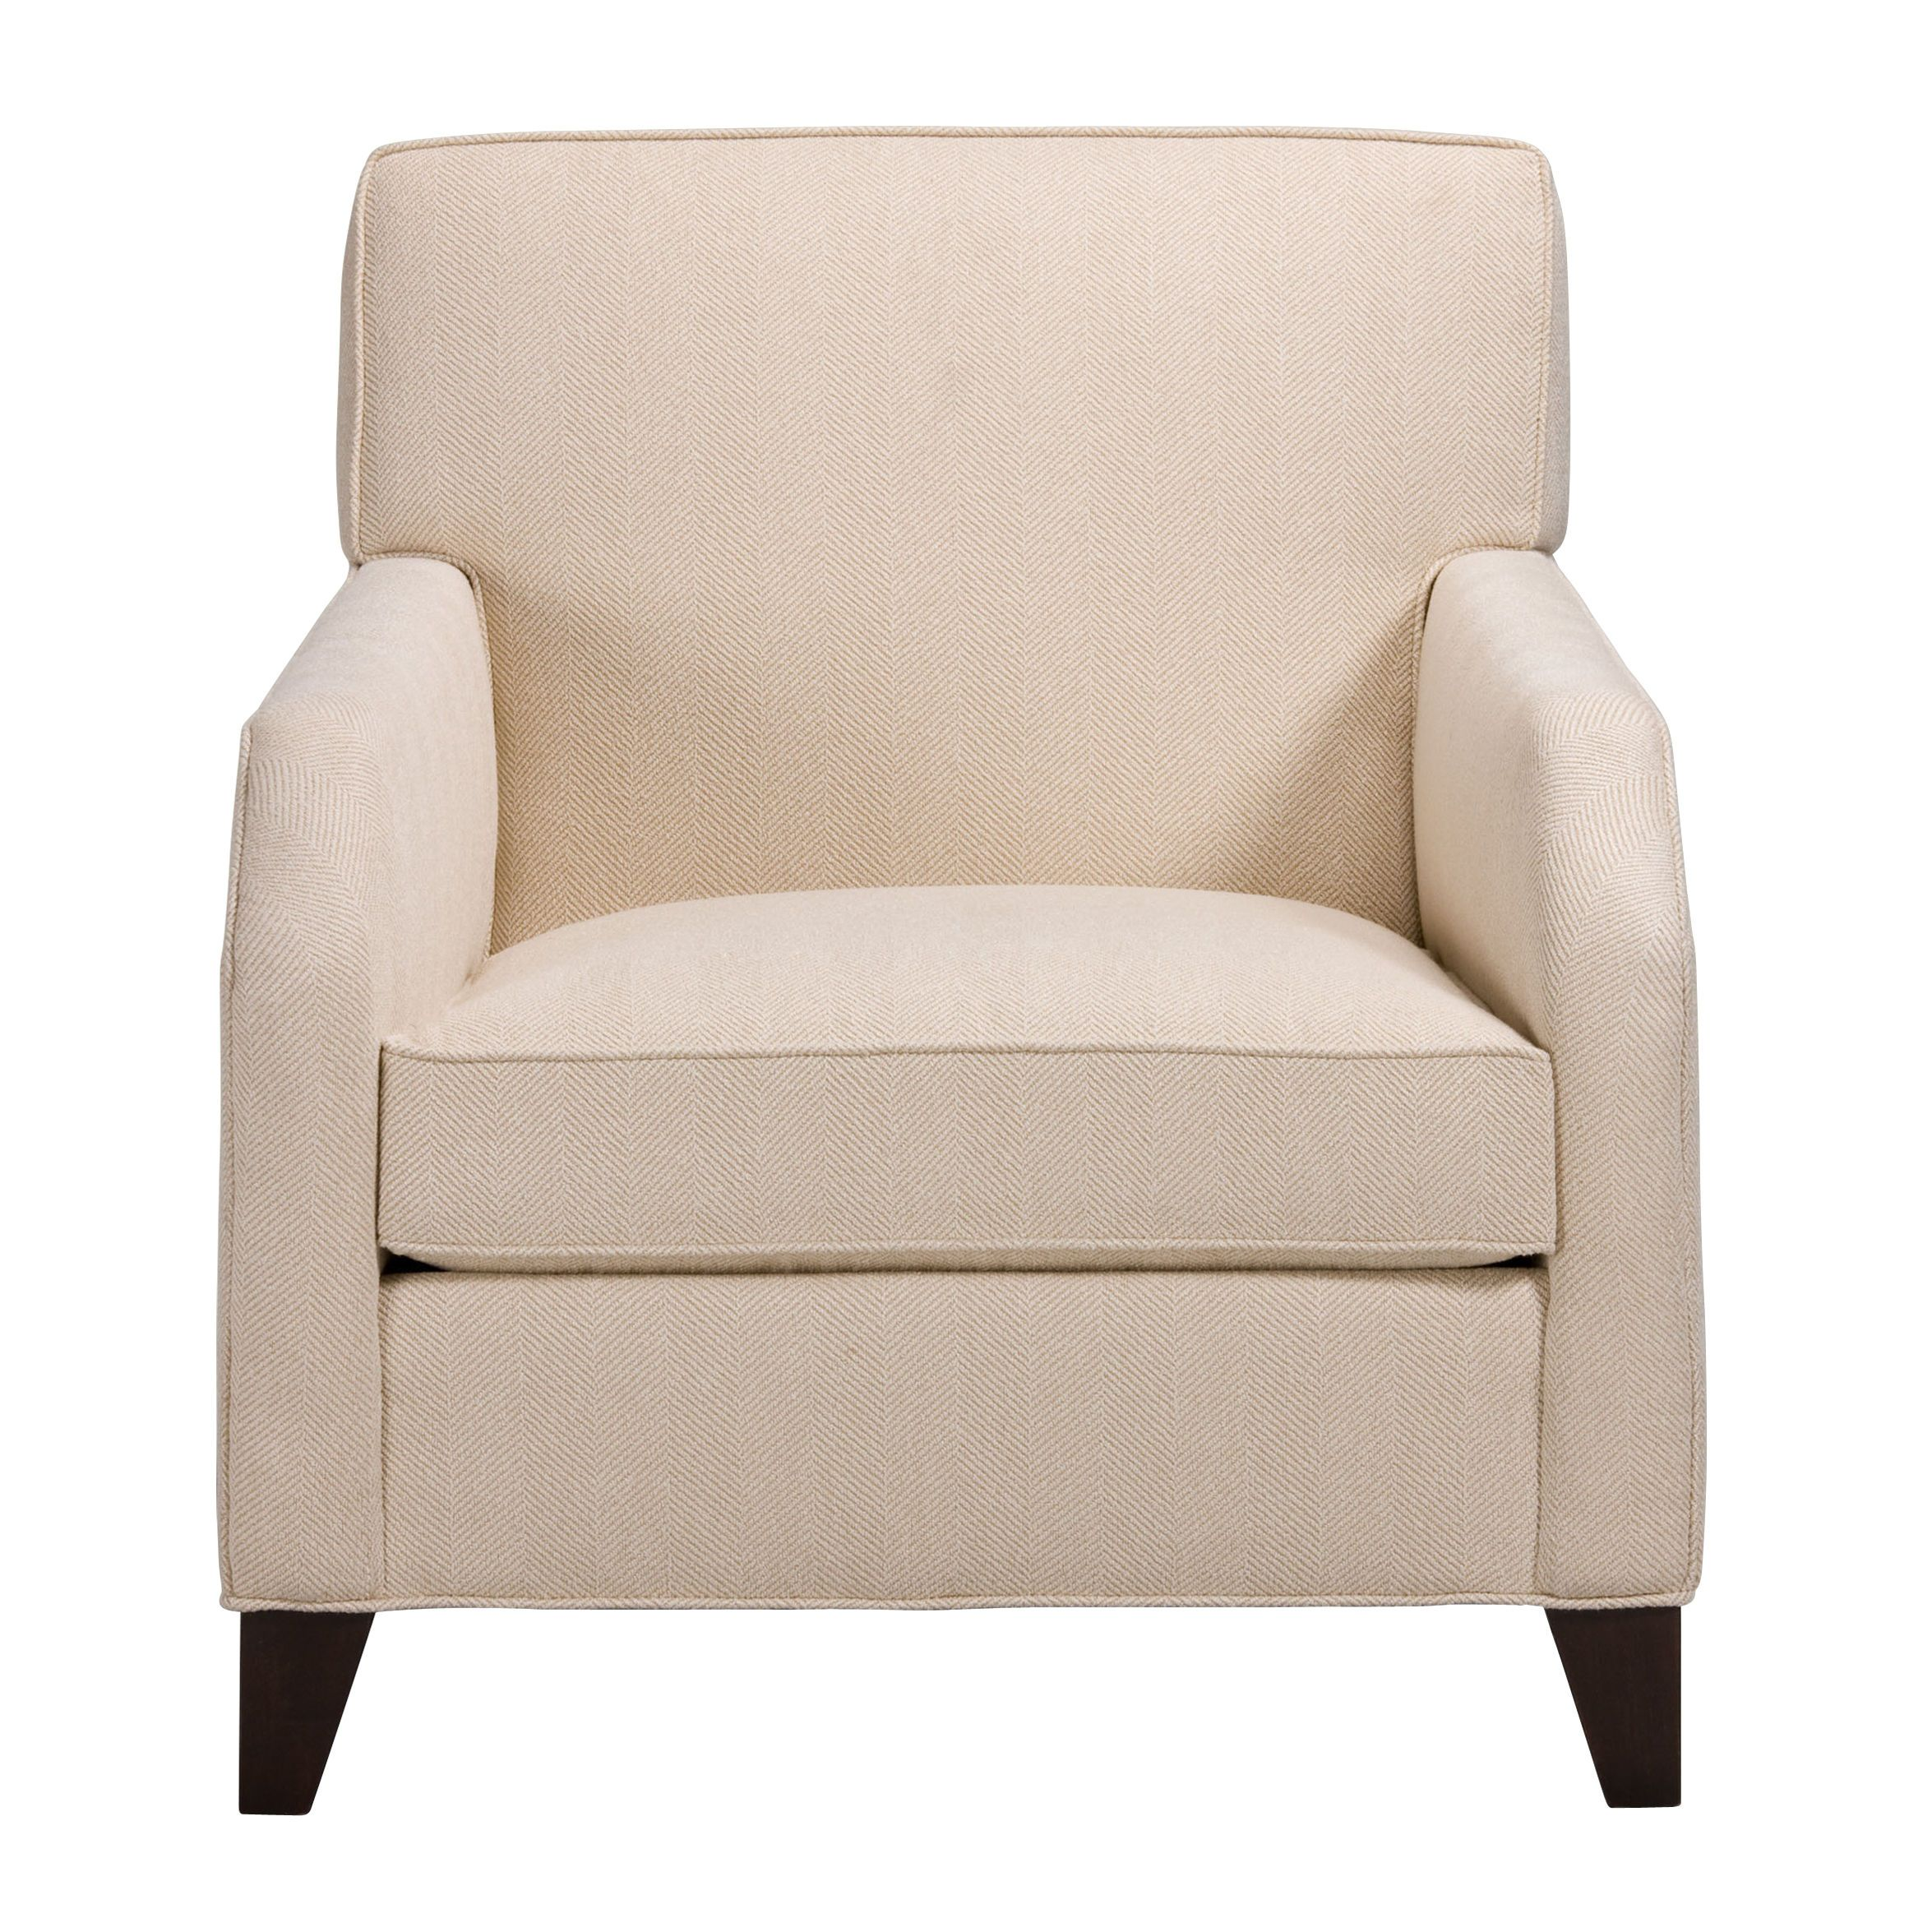 Seville Chair   Ethan Allen US